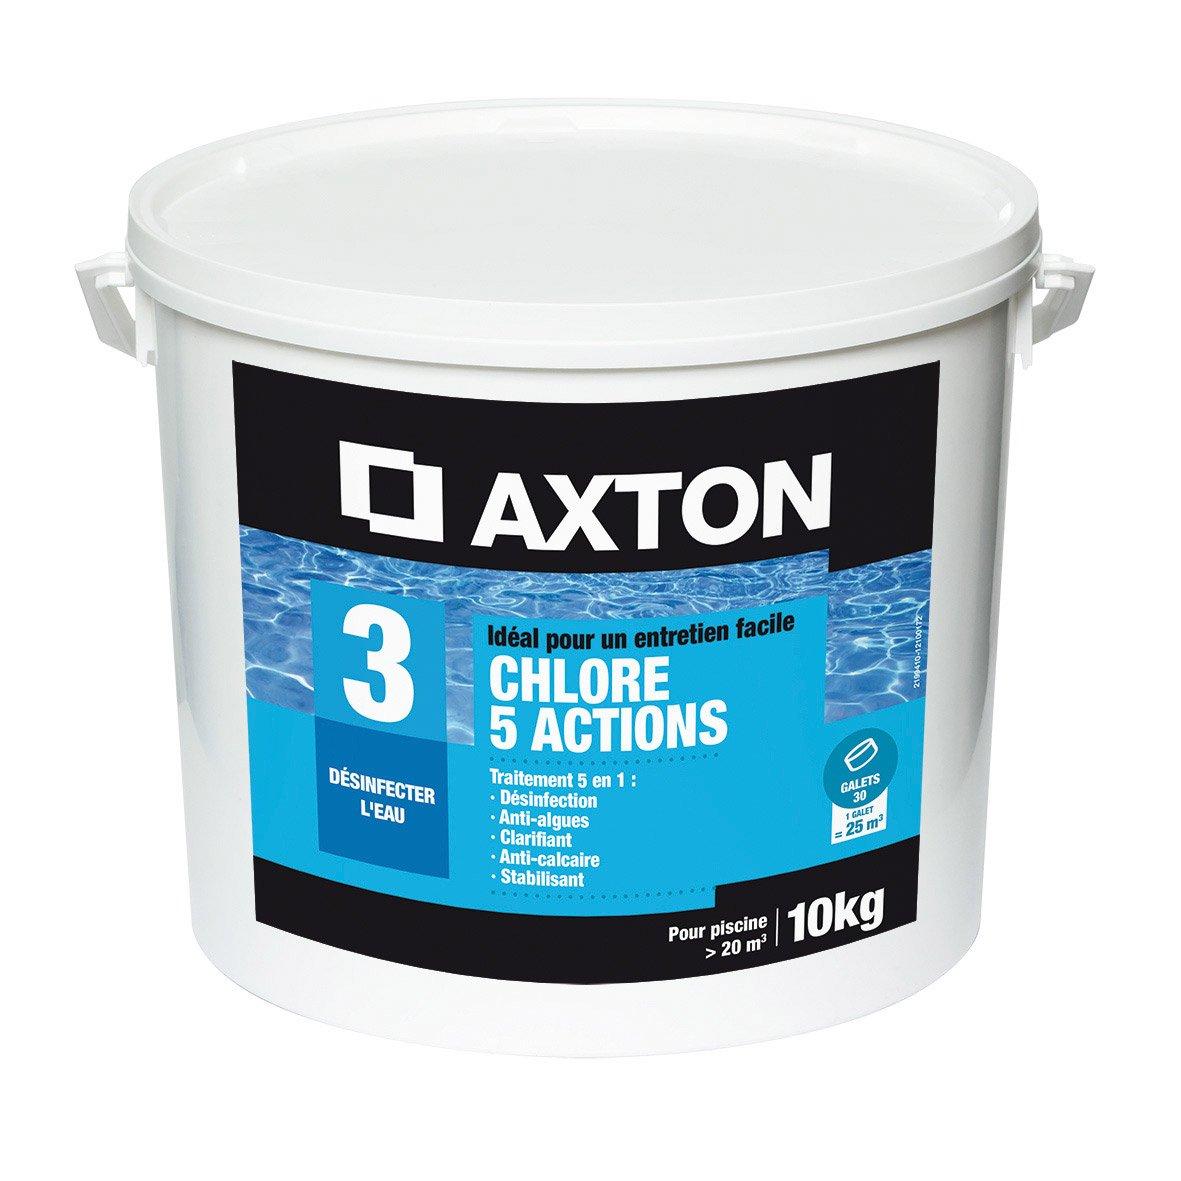 chlore 5 actions piscine axton galet 10 l 10 kg leroy merlin. Black Bedroom Furniture Sets. Home Design Ideas